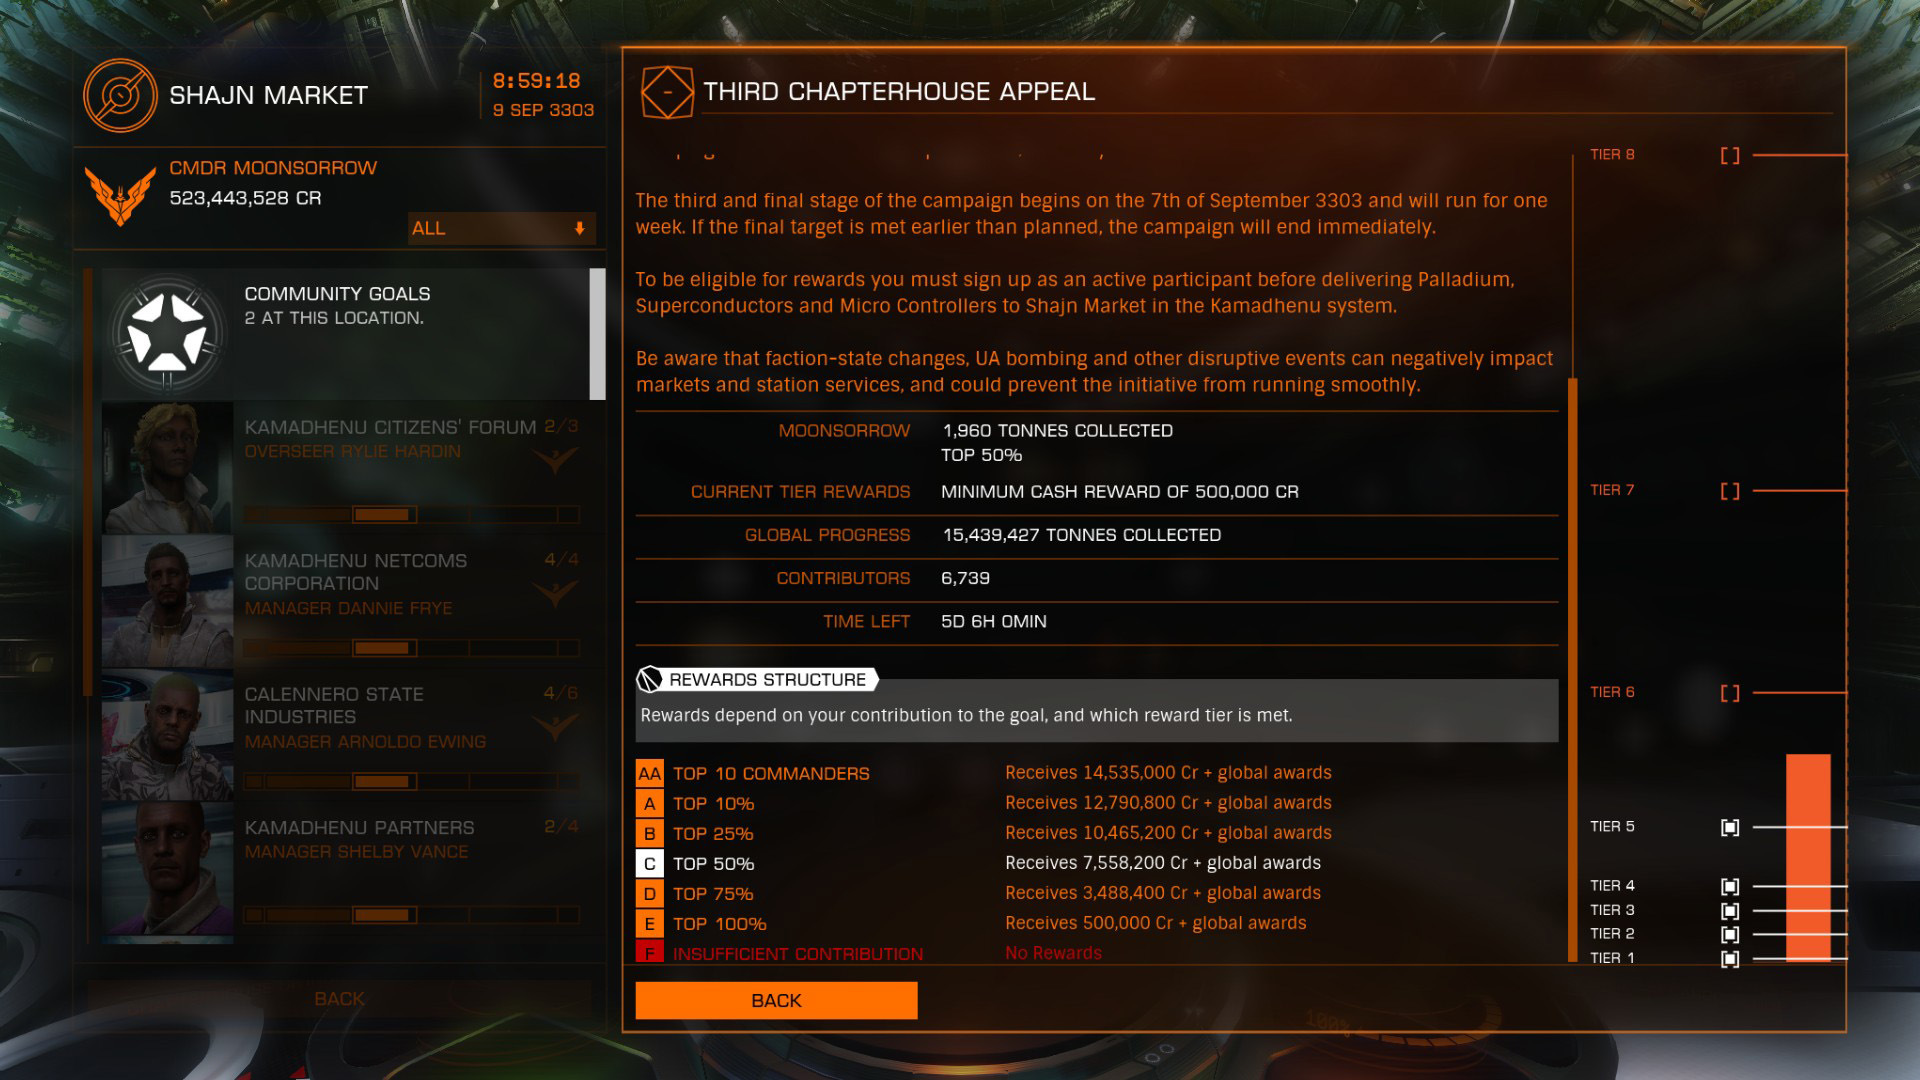 Elite: Dangerous beginner's guide: a screenshot showing community goal progress